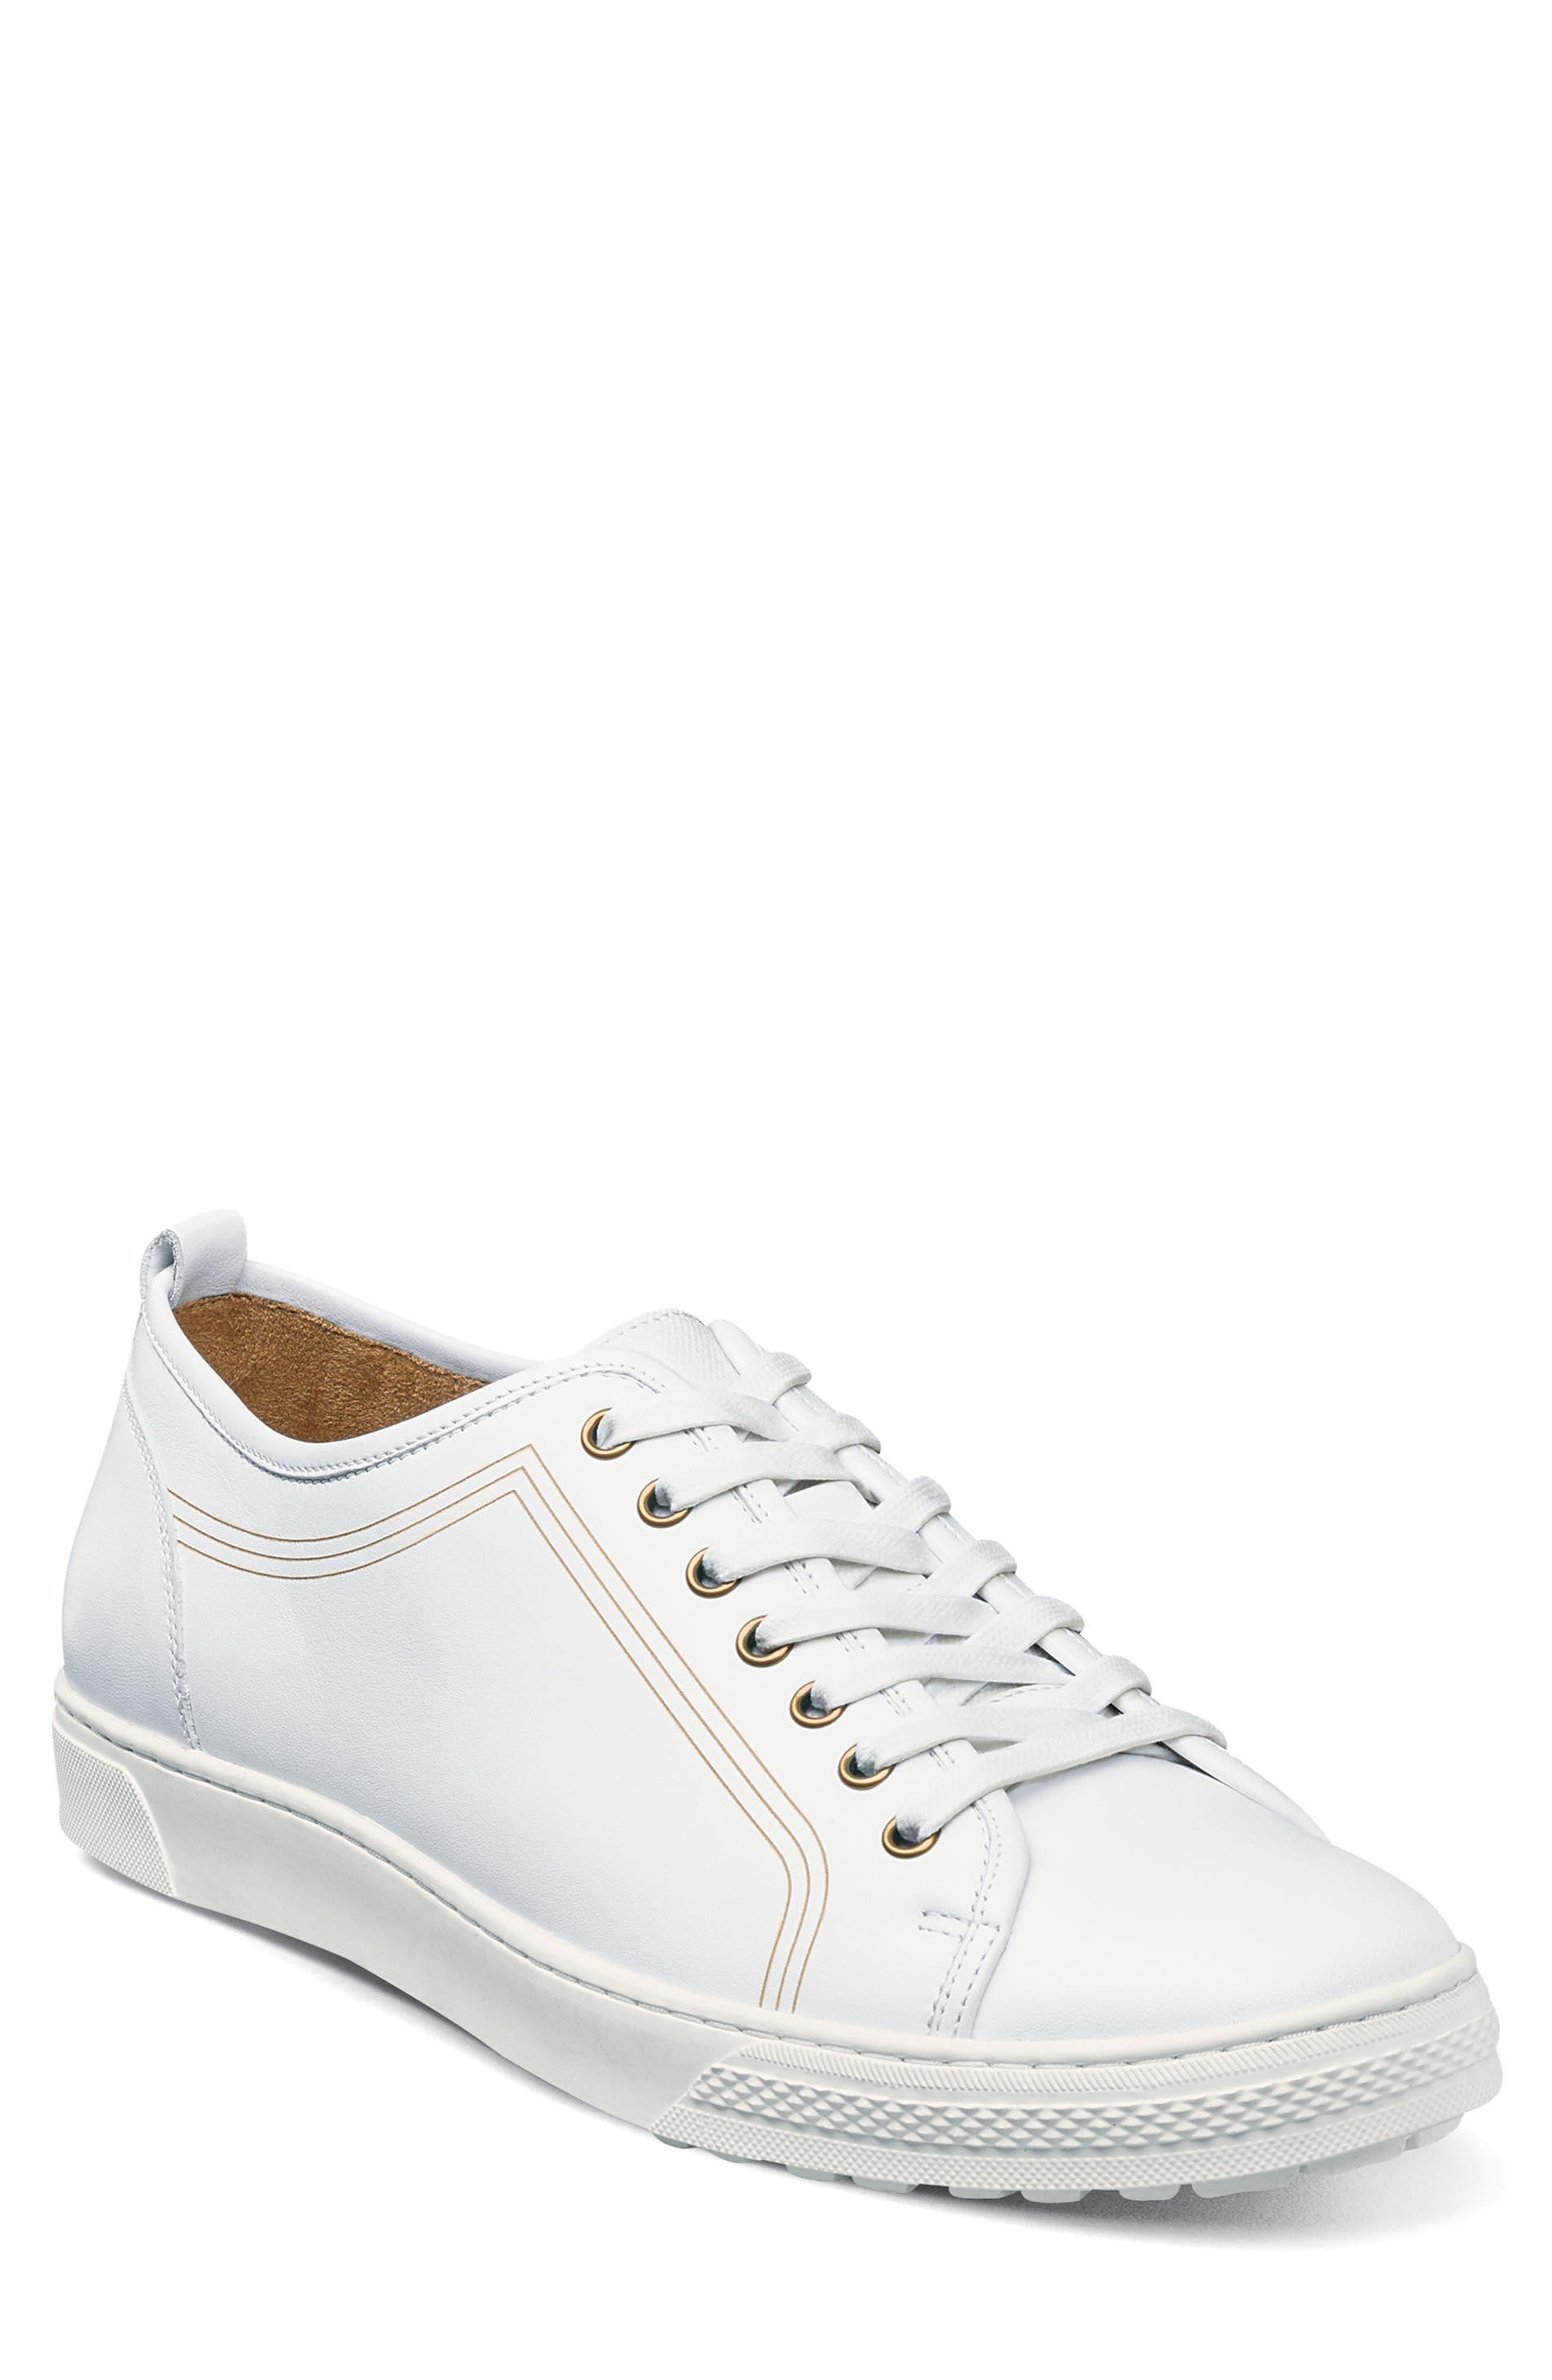 Forward Lo Sneaker,                             Main thumbnail 4, color,